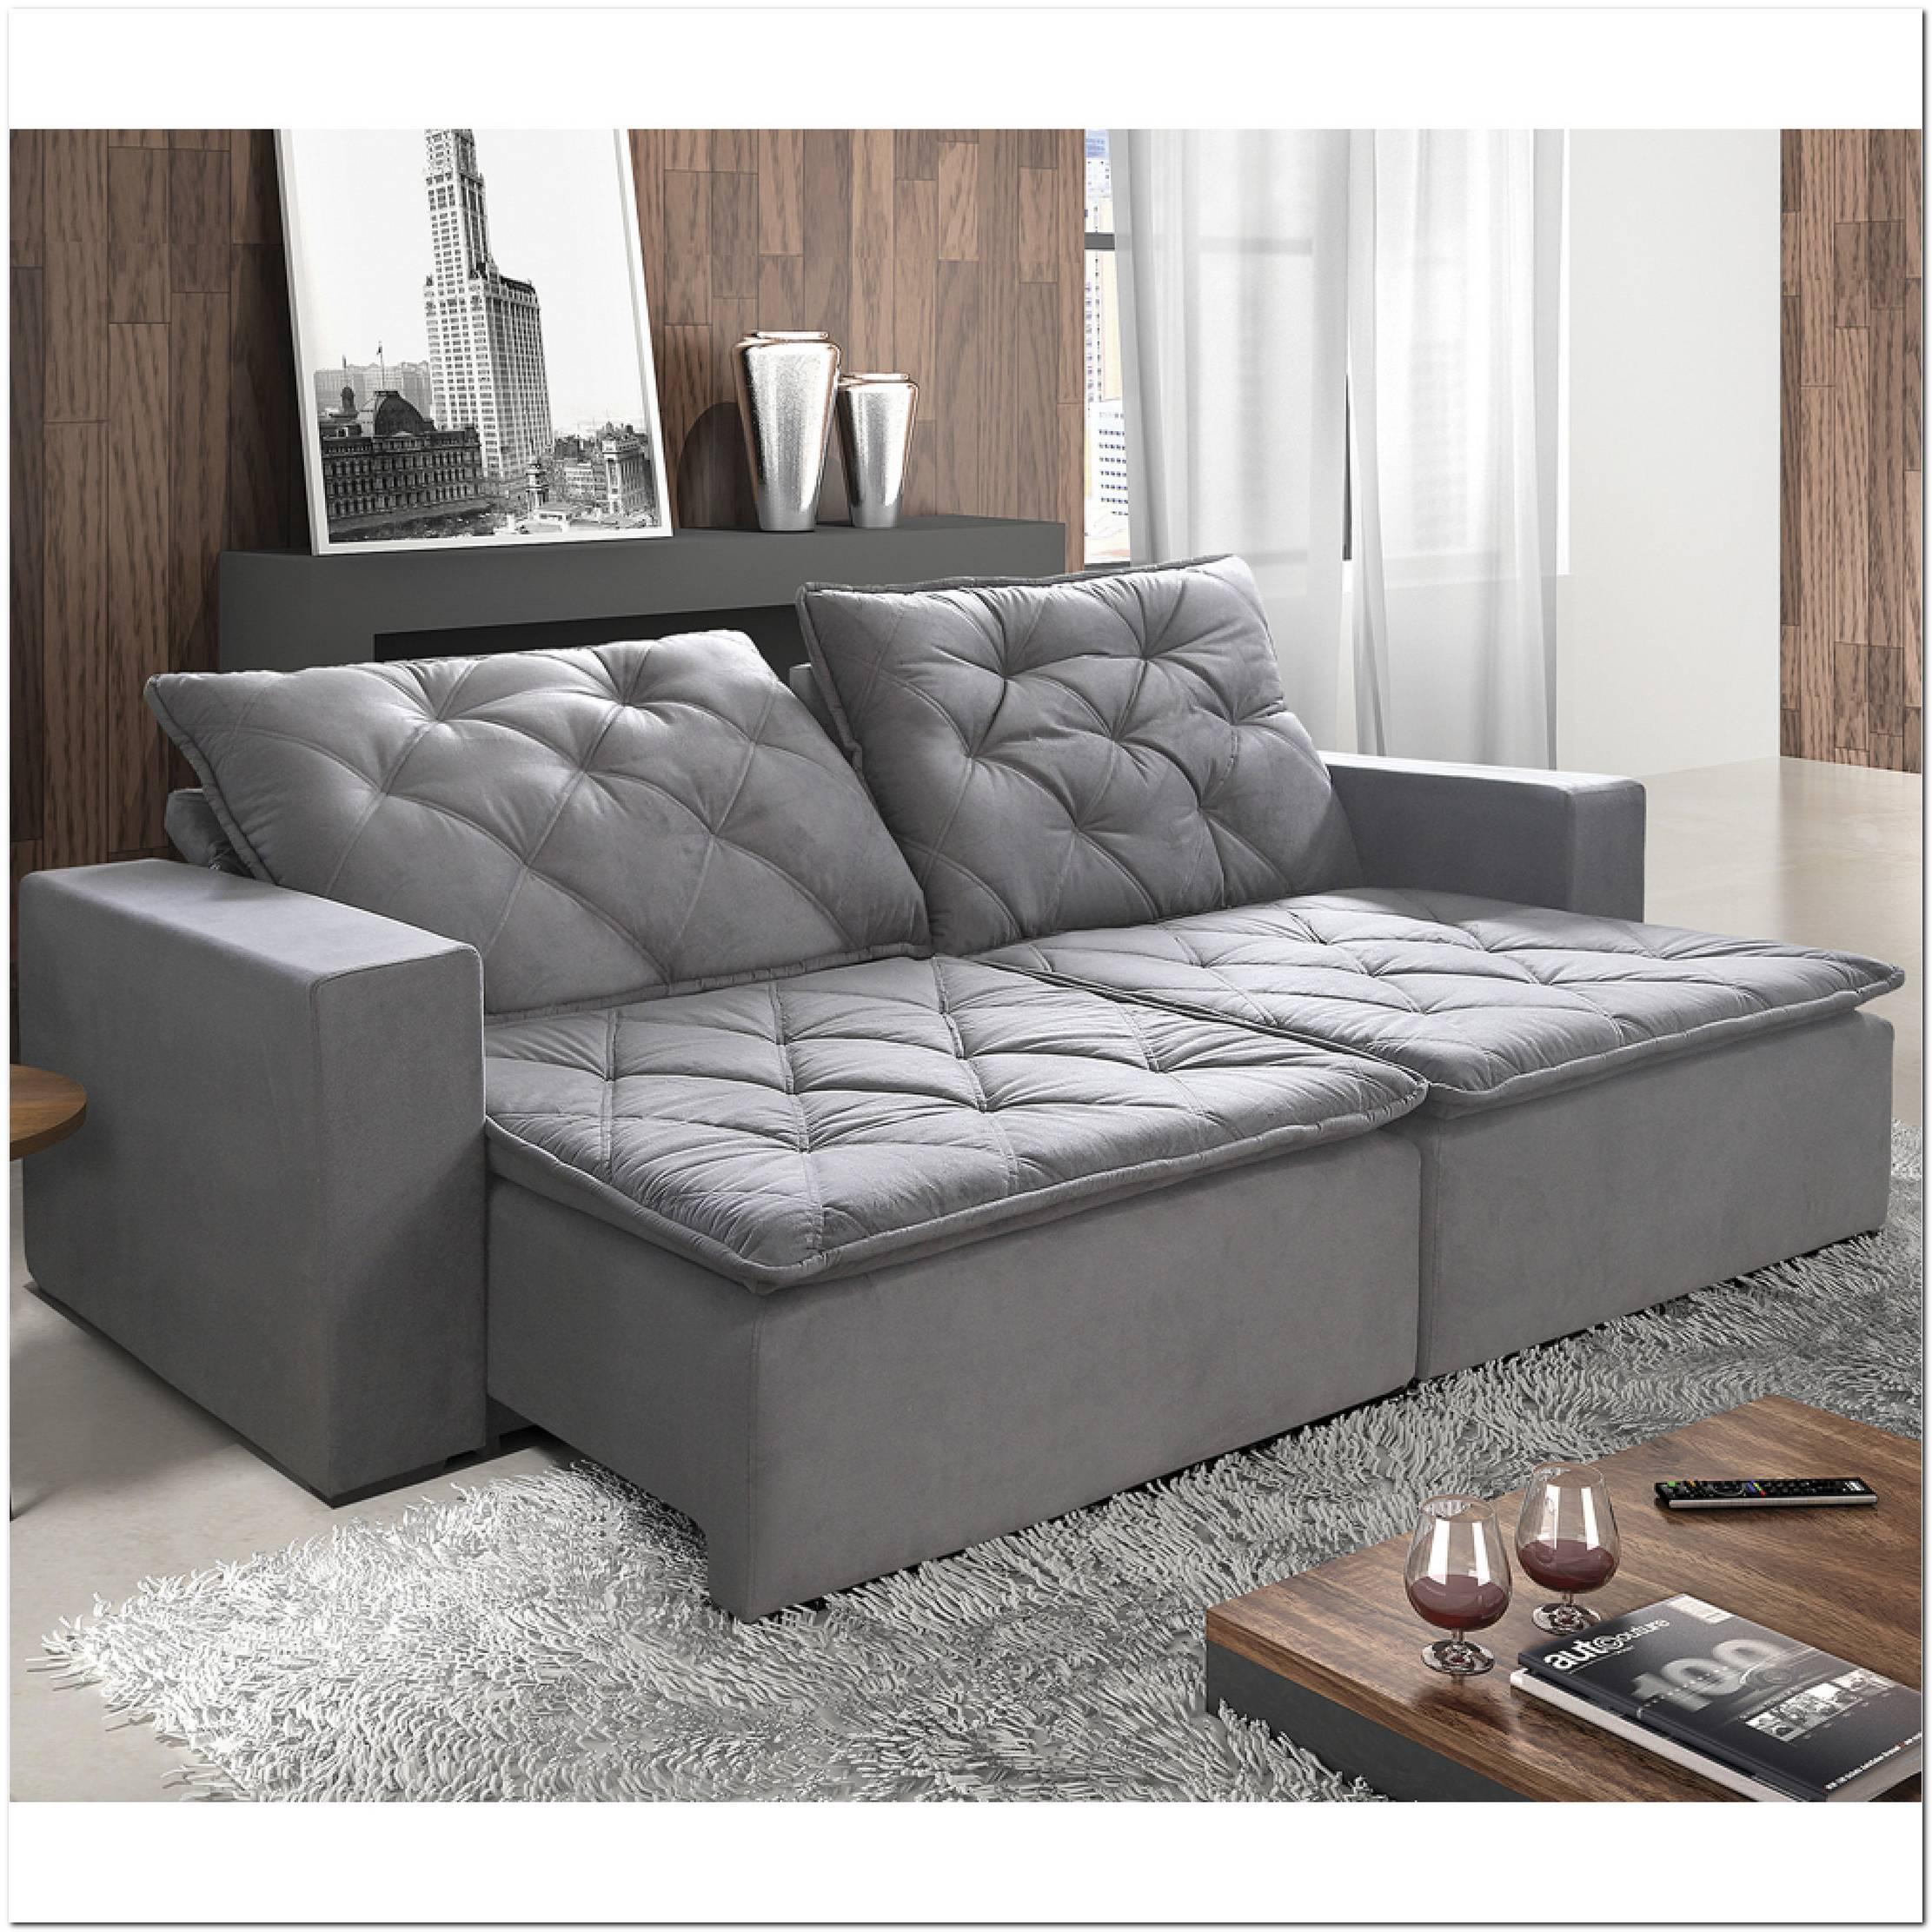 Sofa Cor Cinza